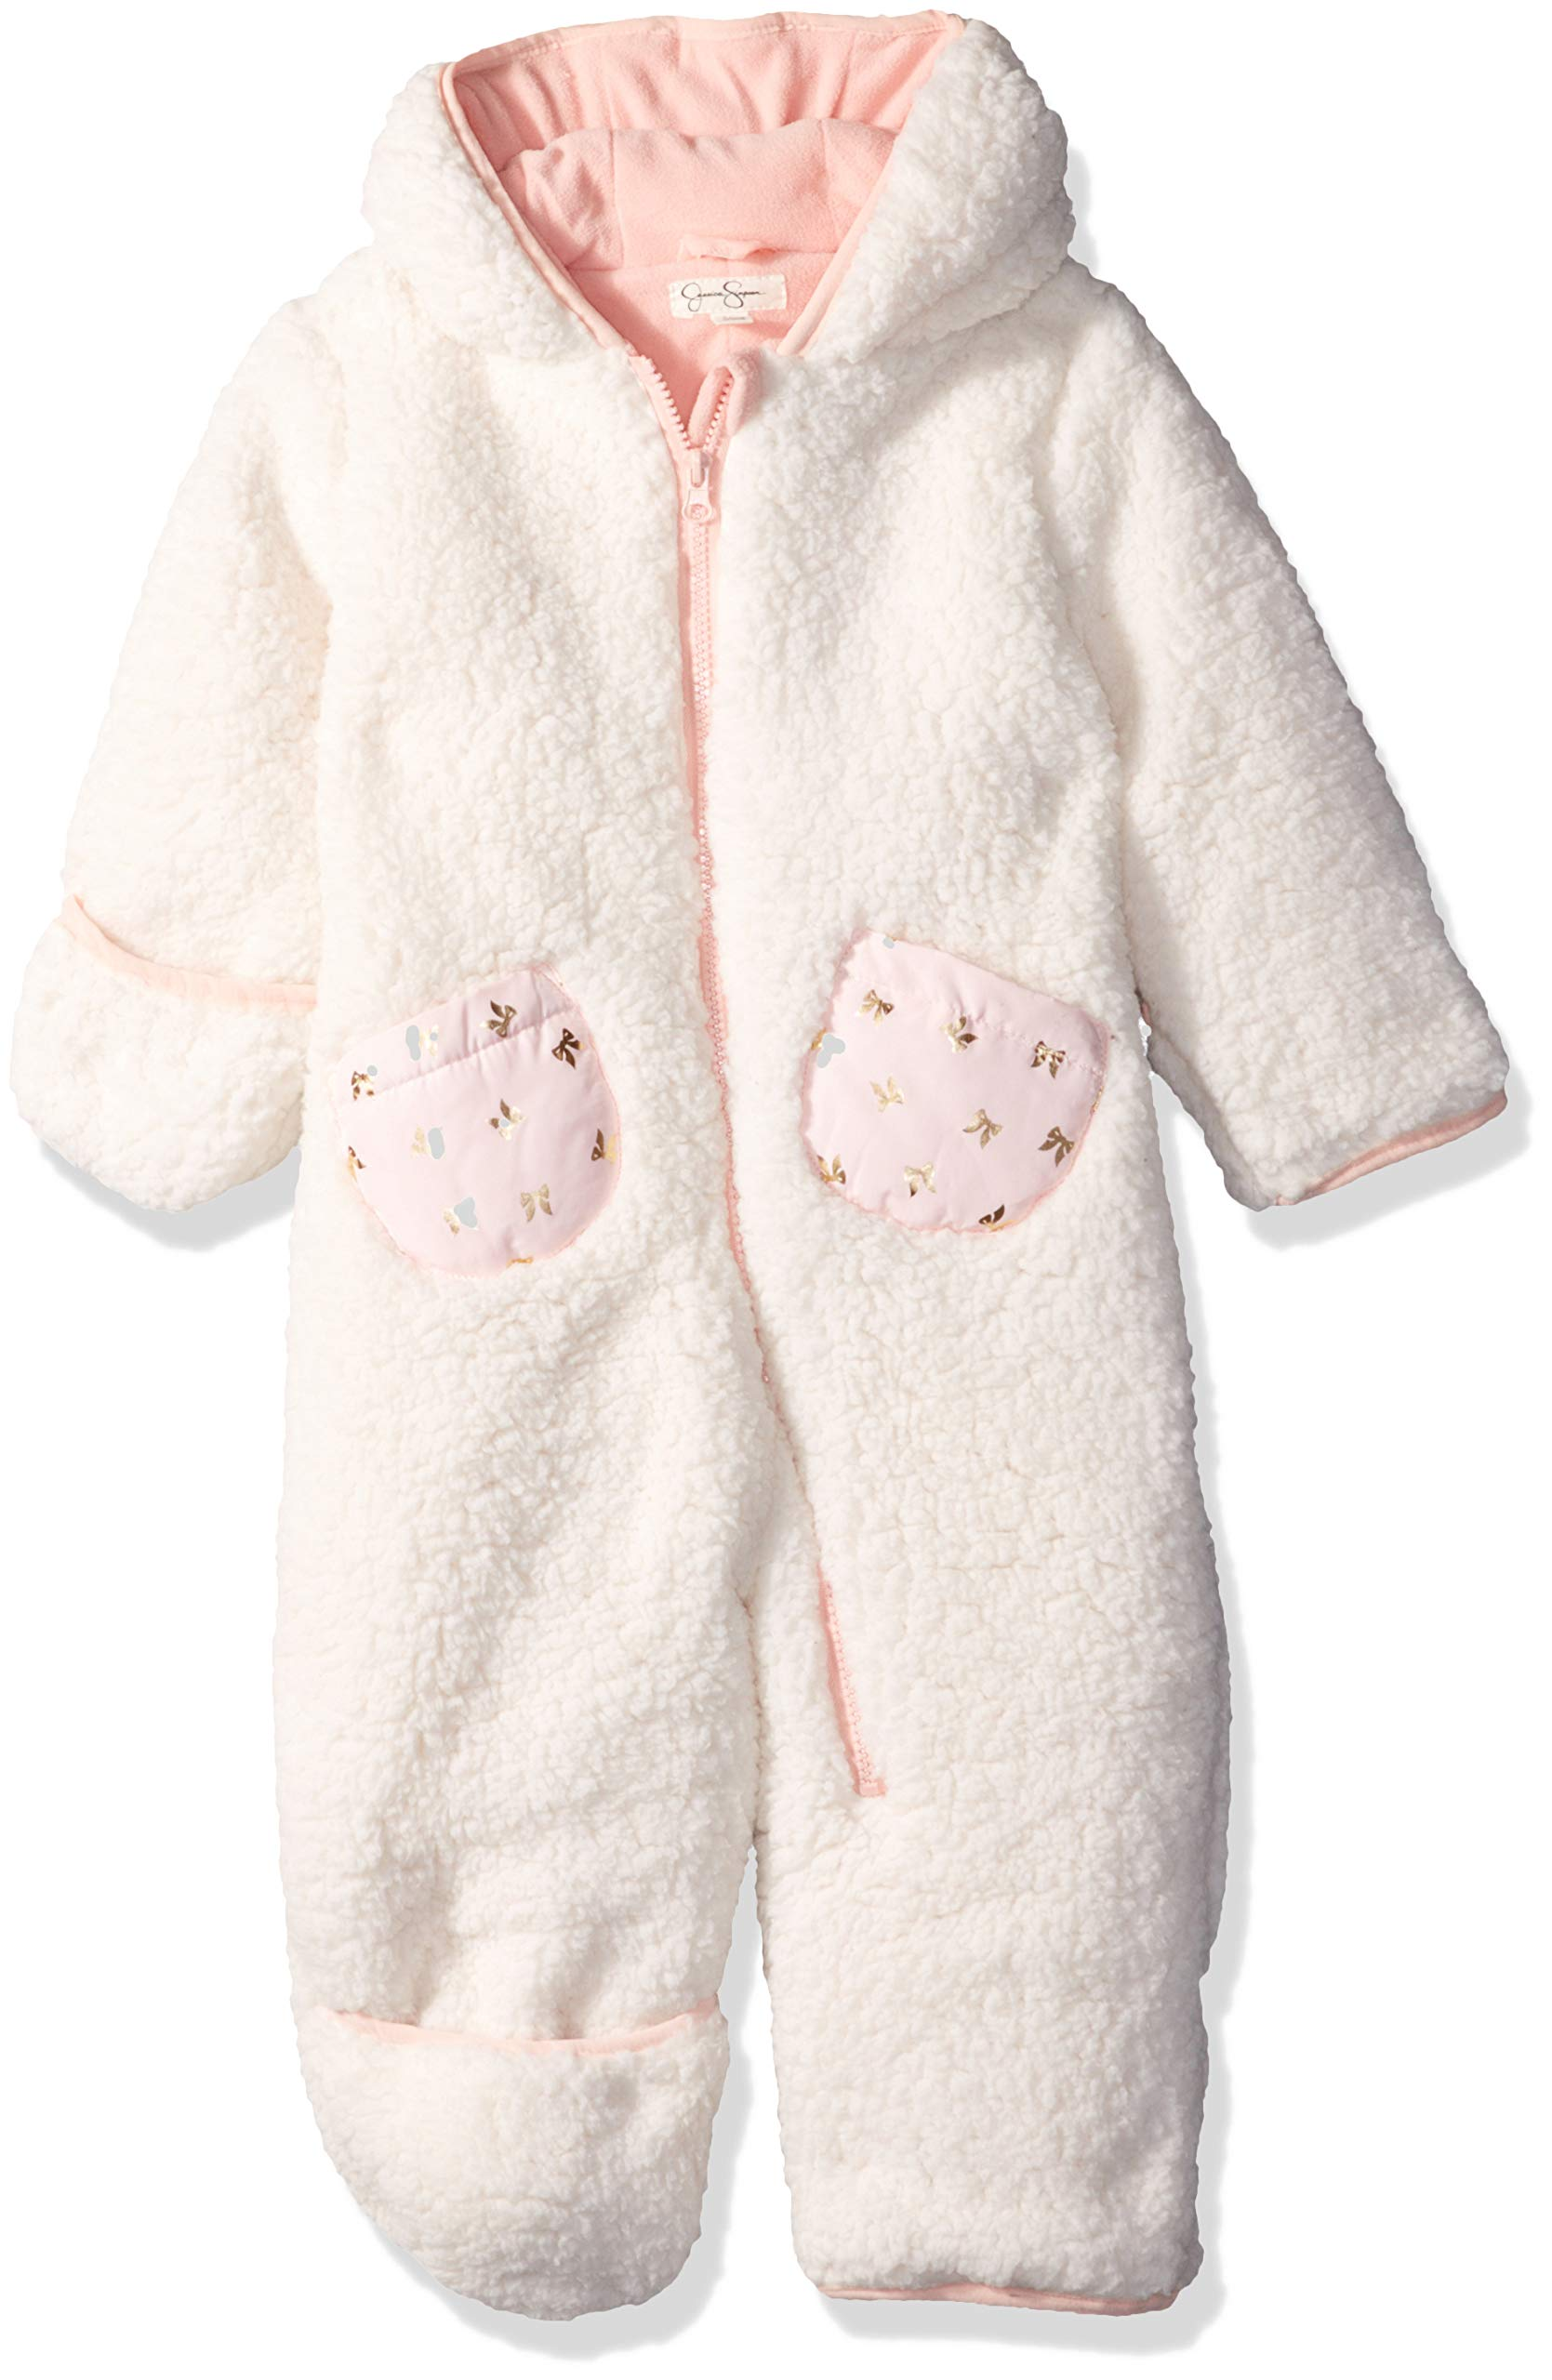 Jessica Simpson Baby Girls Sherpa Pram, Cream, 6-9 Months by Jessica Simpson